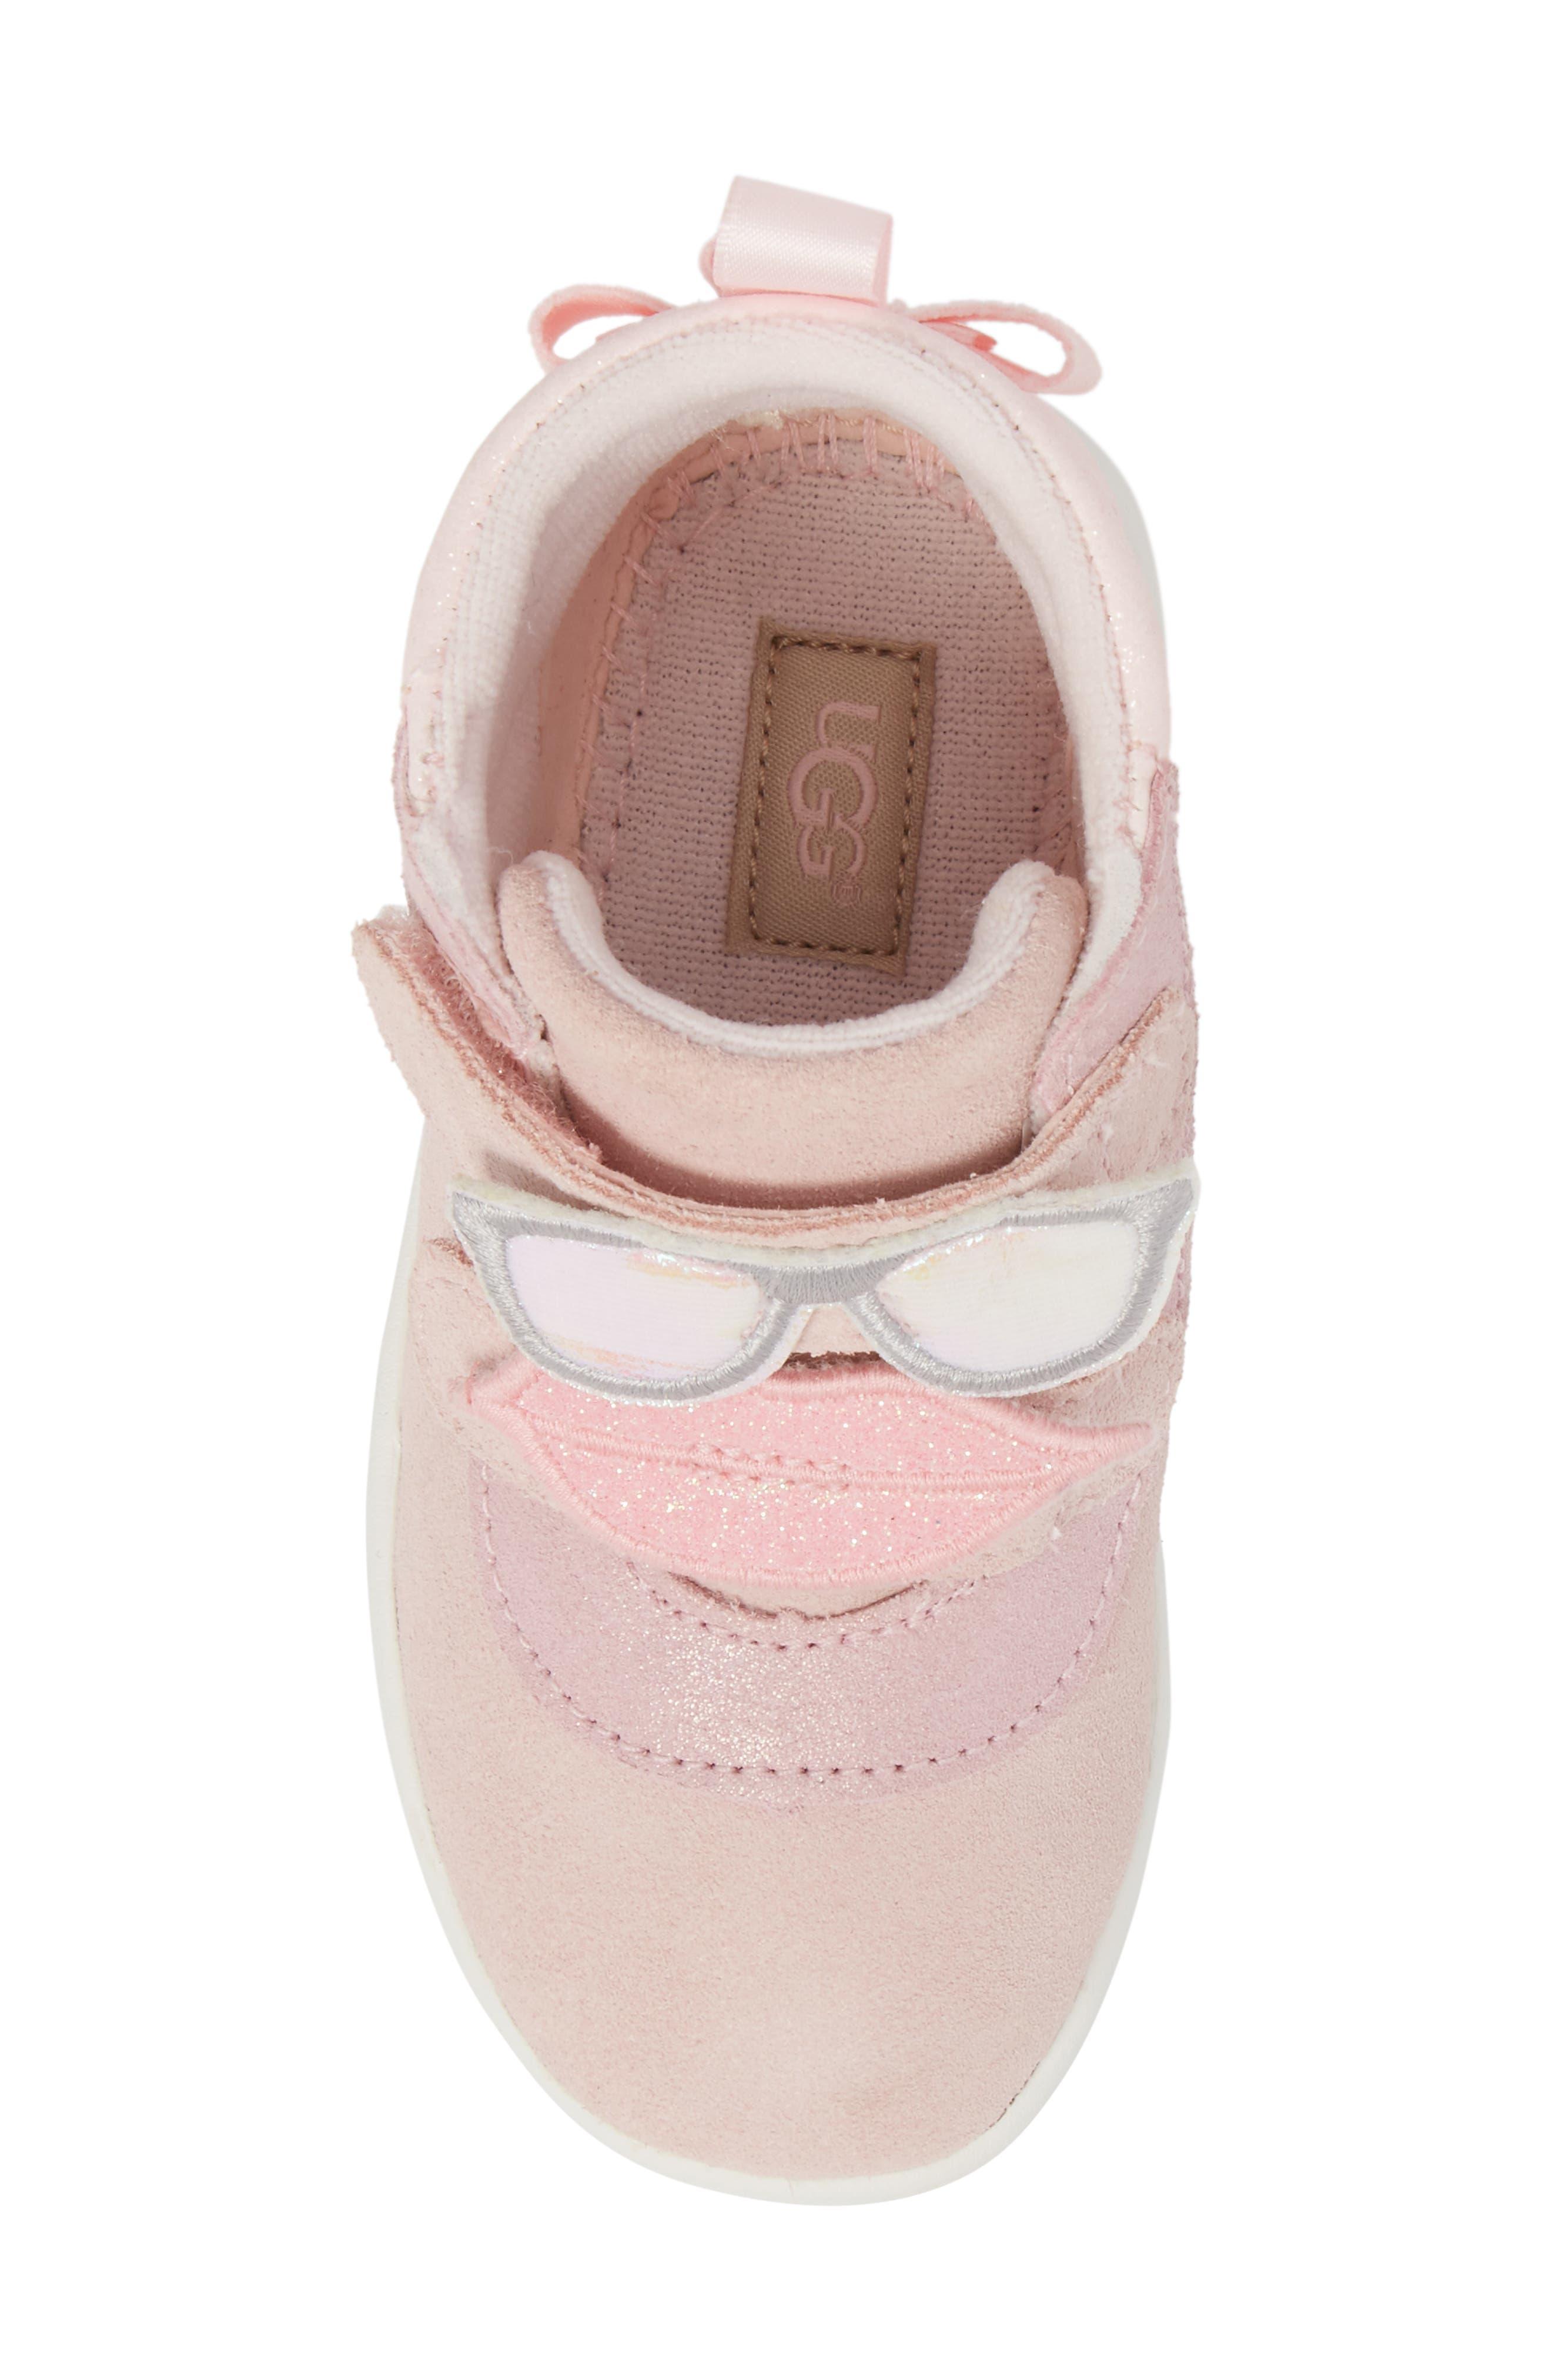 Livv Sunglass Appliqué Sneaker,                             Alternate thumbnail 5, color,                             Seashell Pink